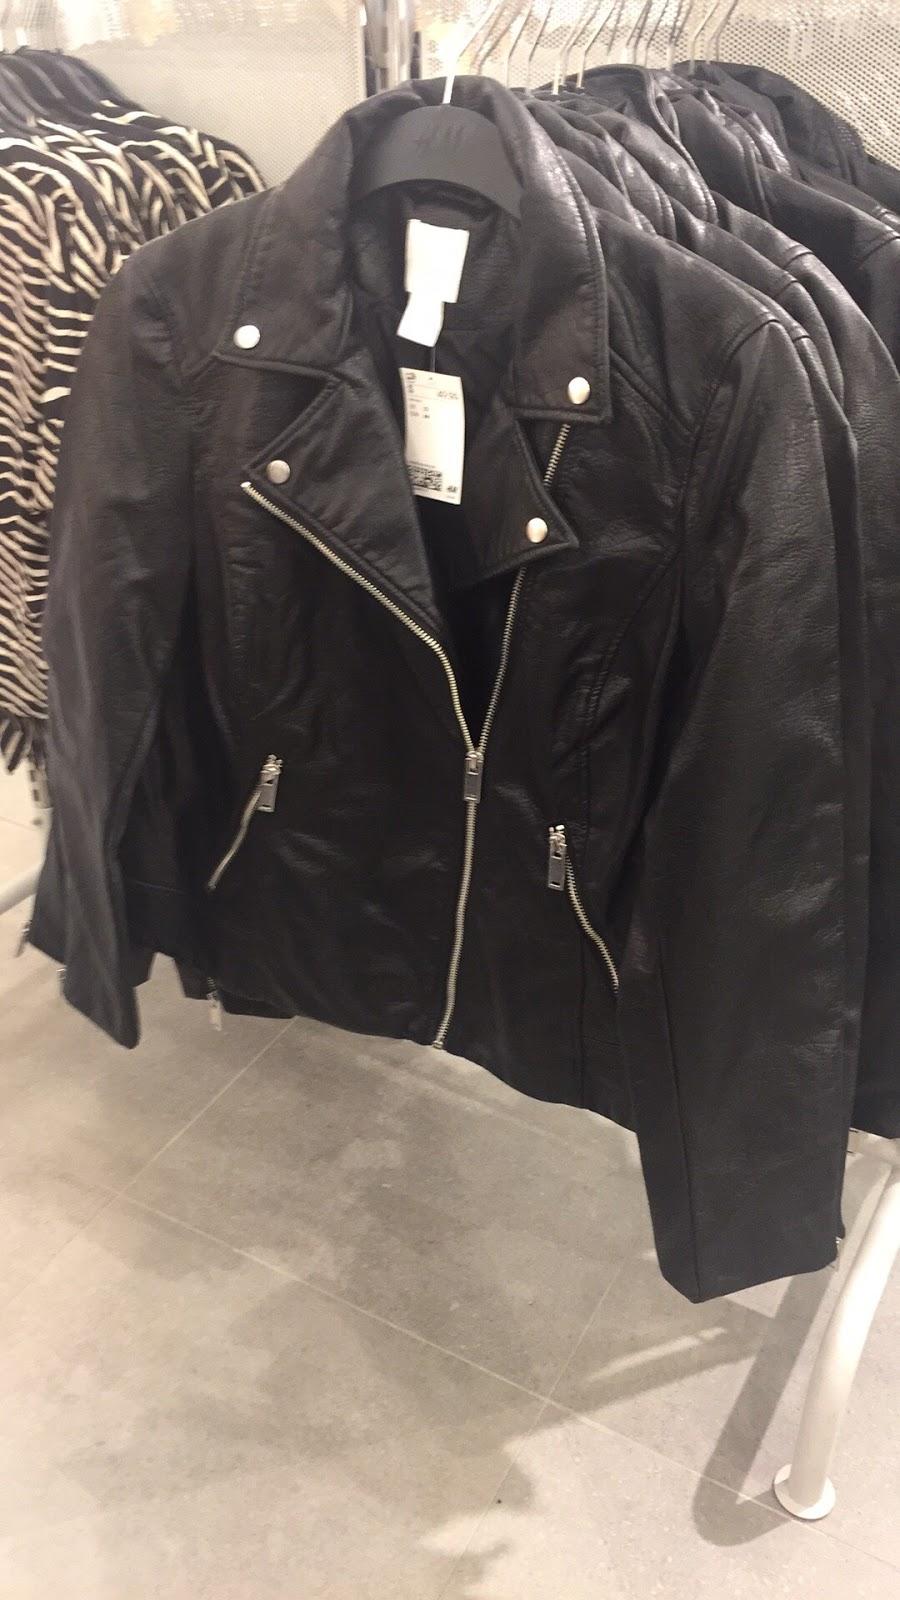 H&M - clothing store  | Photo 9 of 10 | Address: 1600 Water St, Laredo, TX 78040, USA | Phone: (855) 466-7467